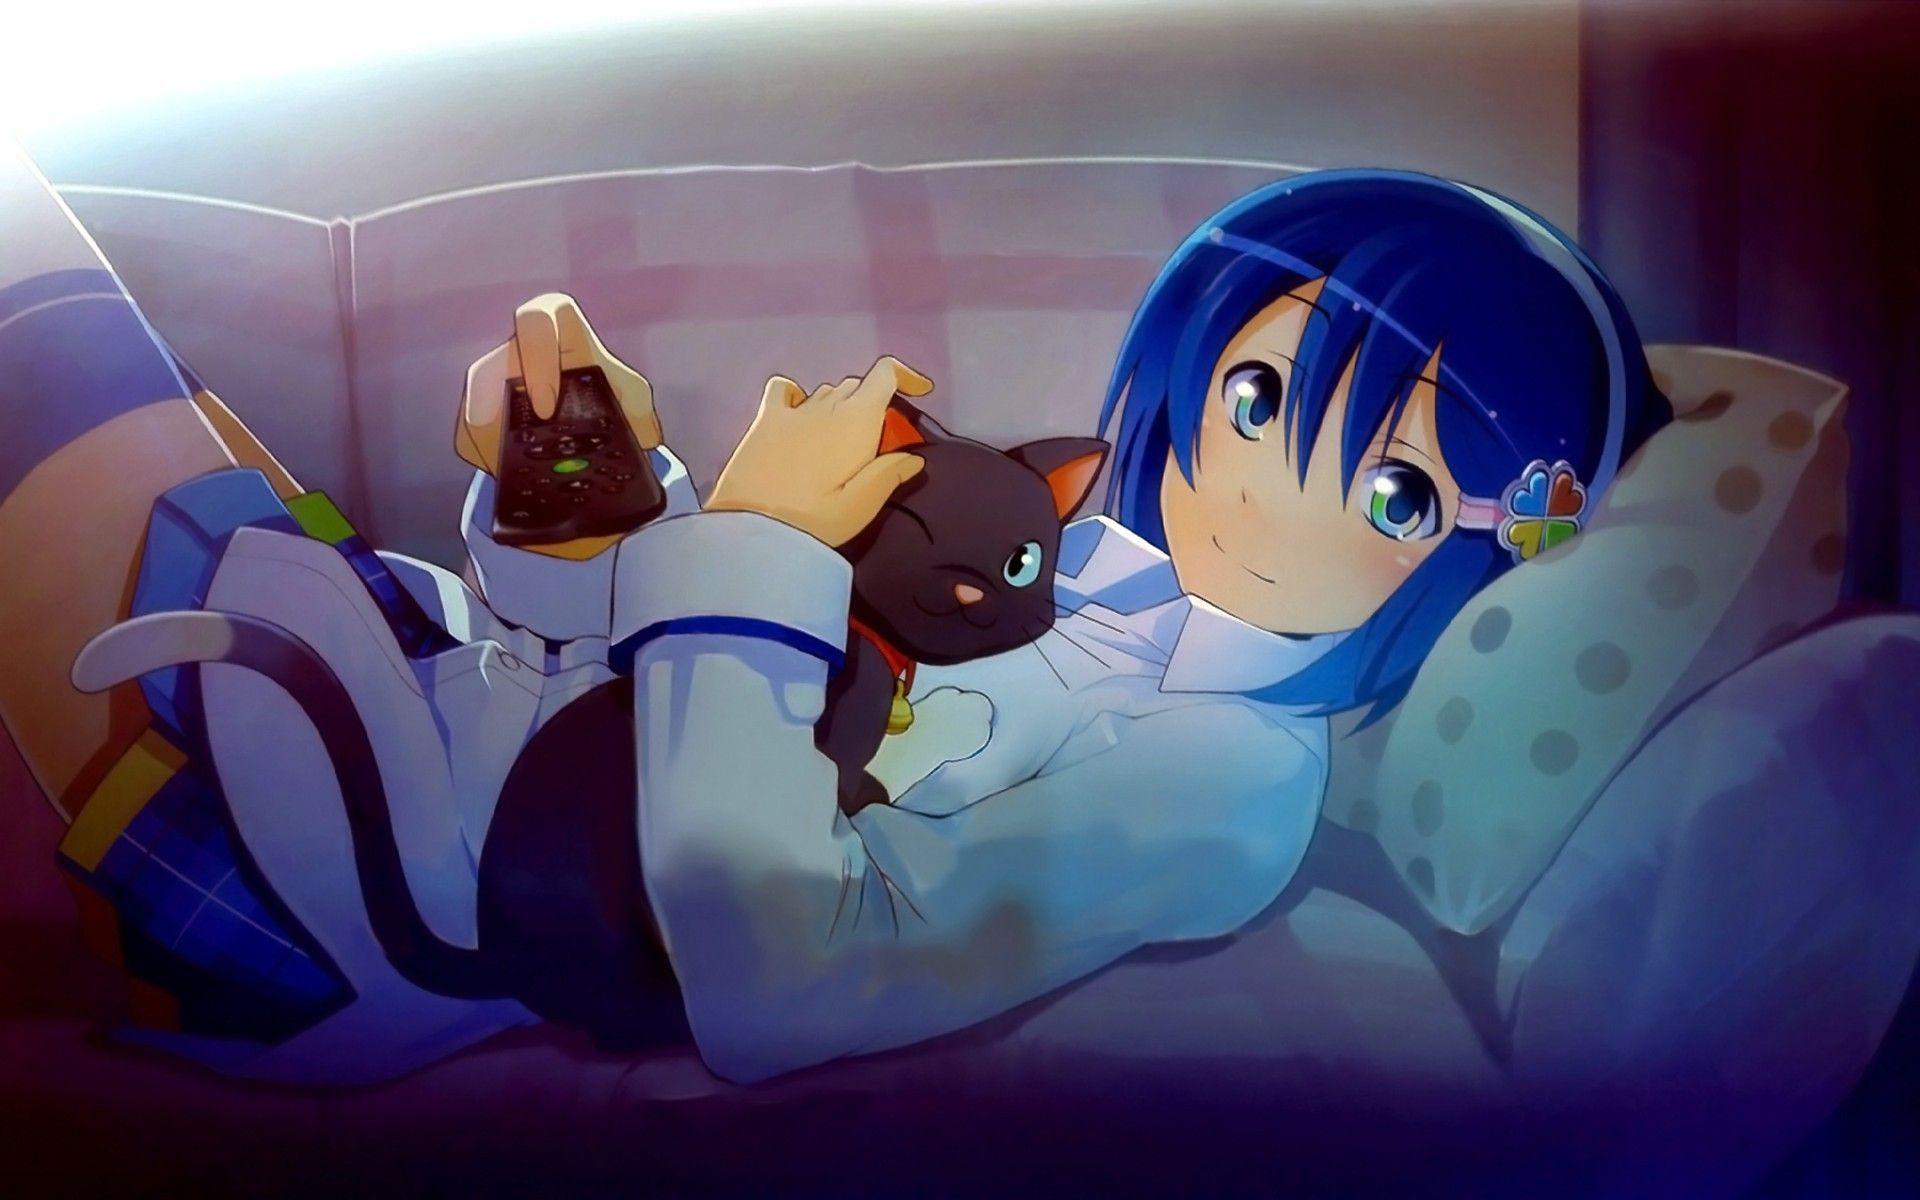 fond d'ecran anime 1920x1200